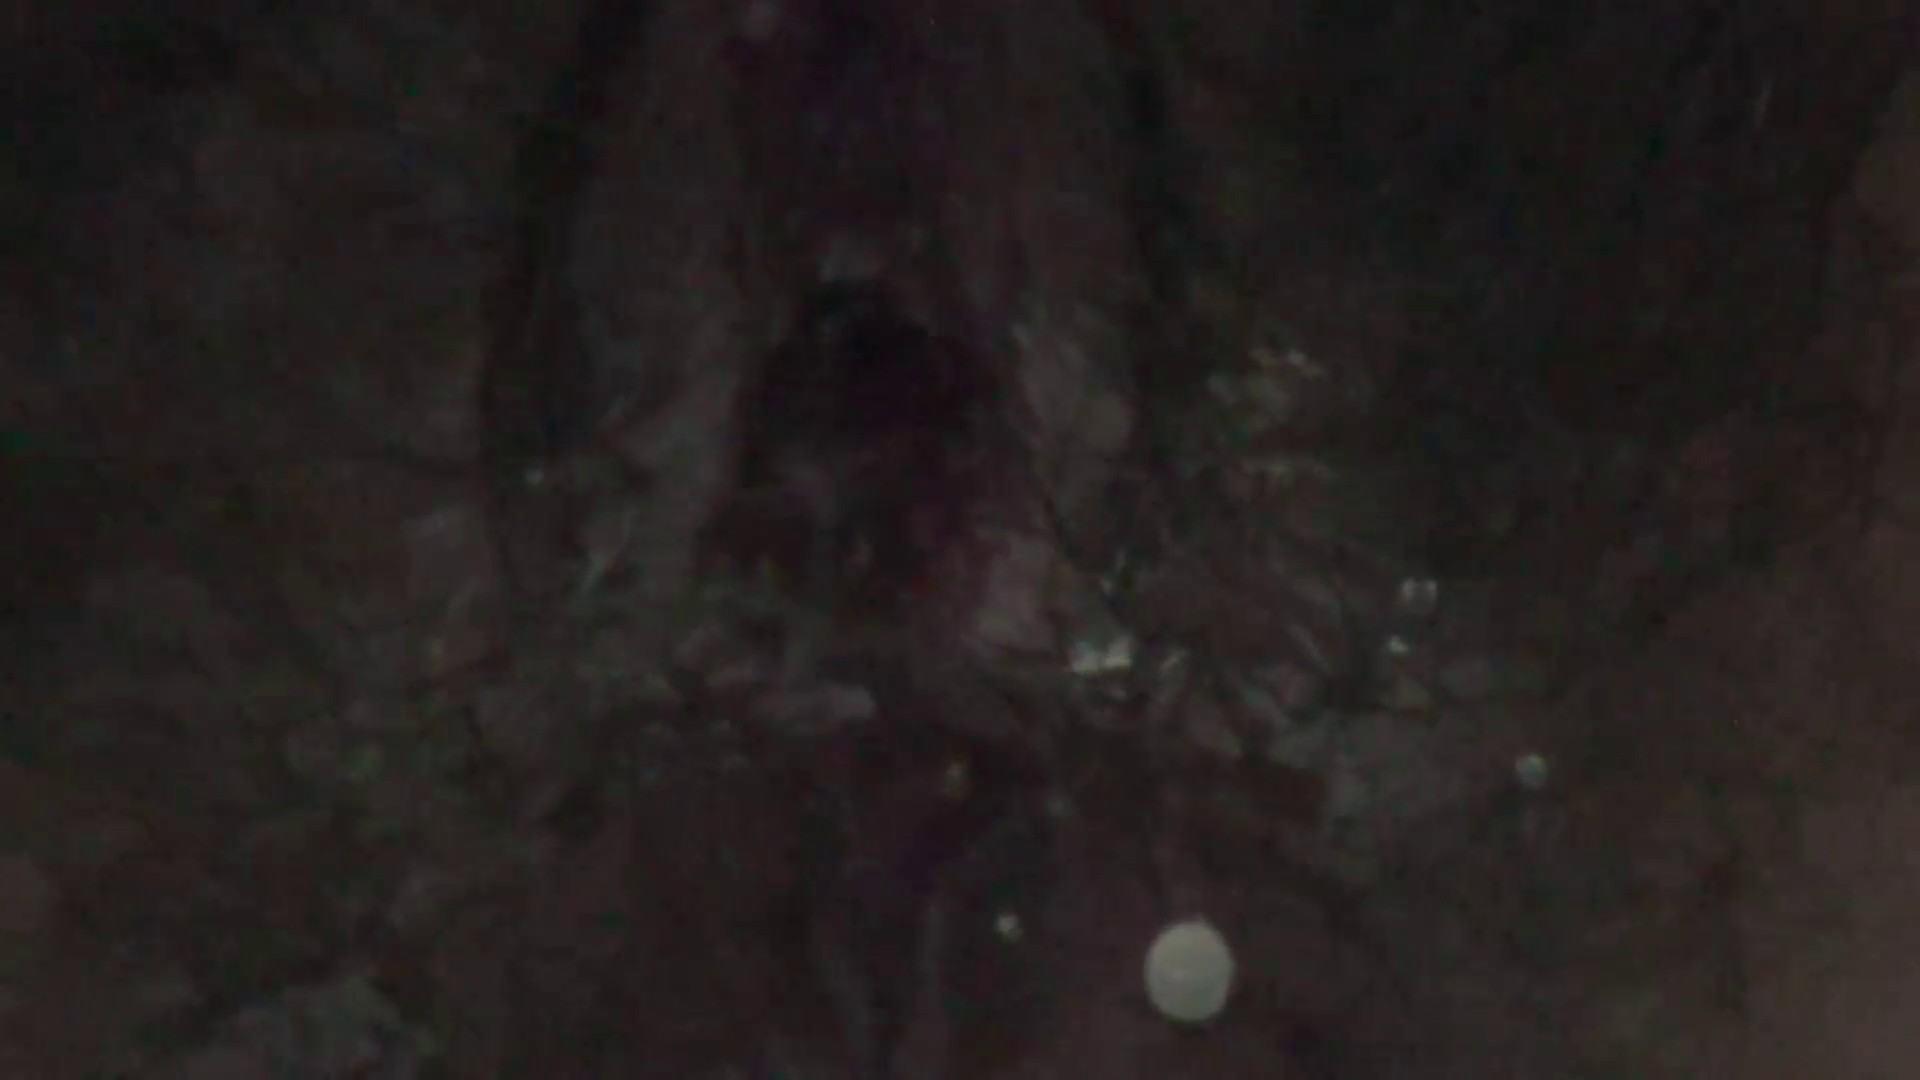 JD盗撮 美女の洗面所の秘密 Vol.28 OLのボディ  55PIX 55